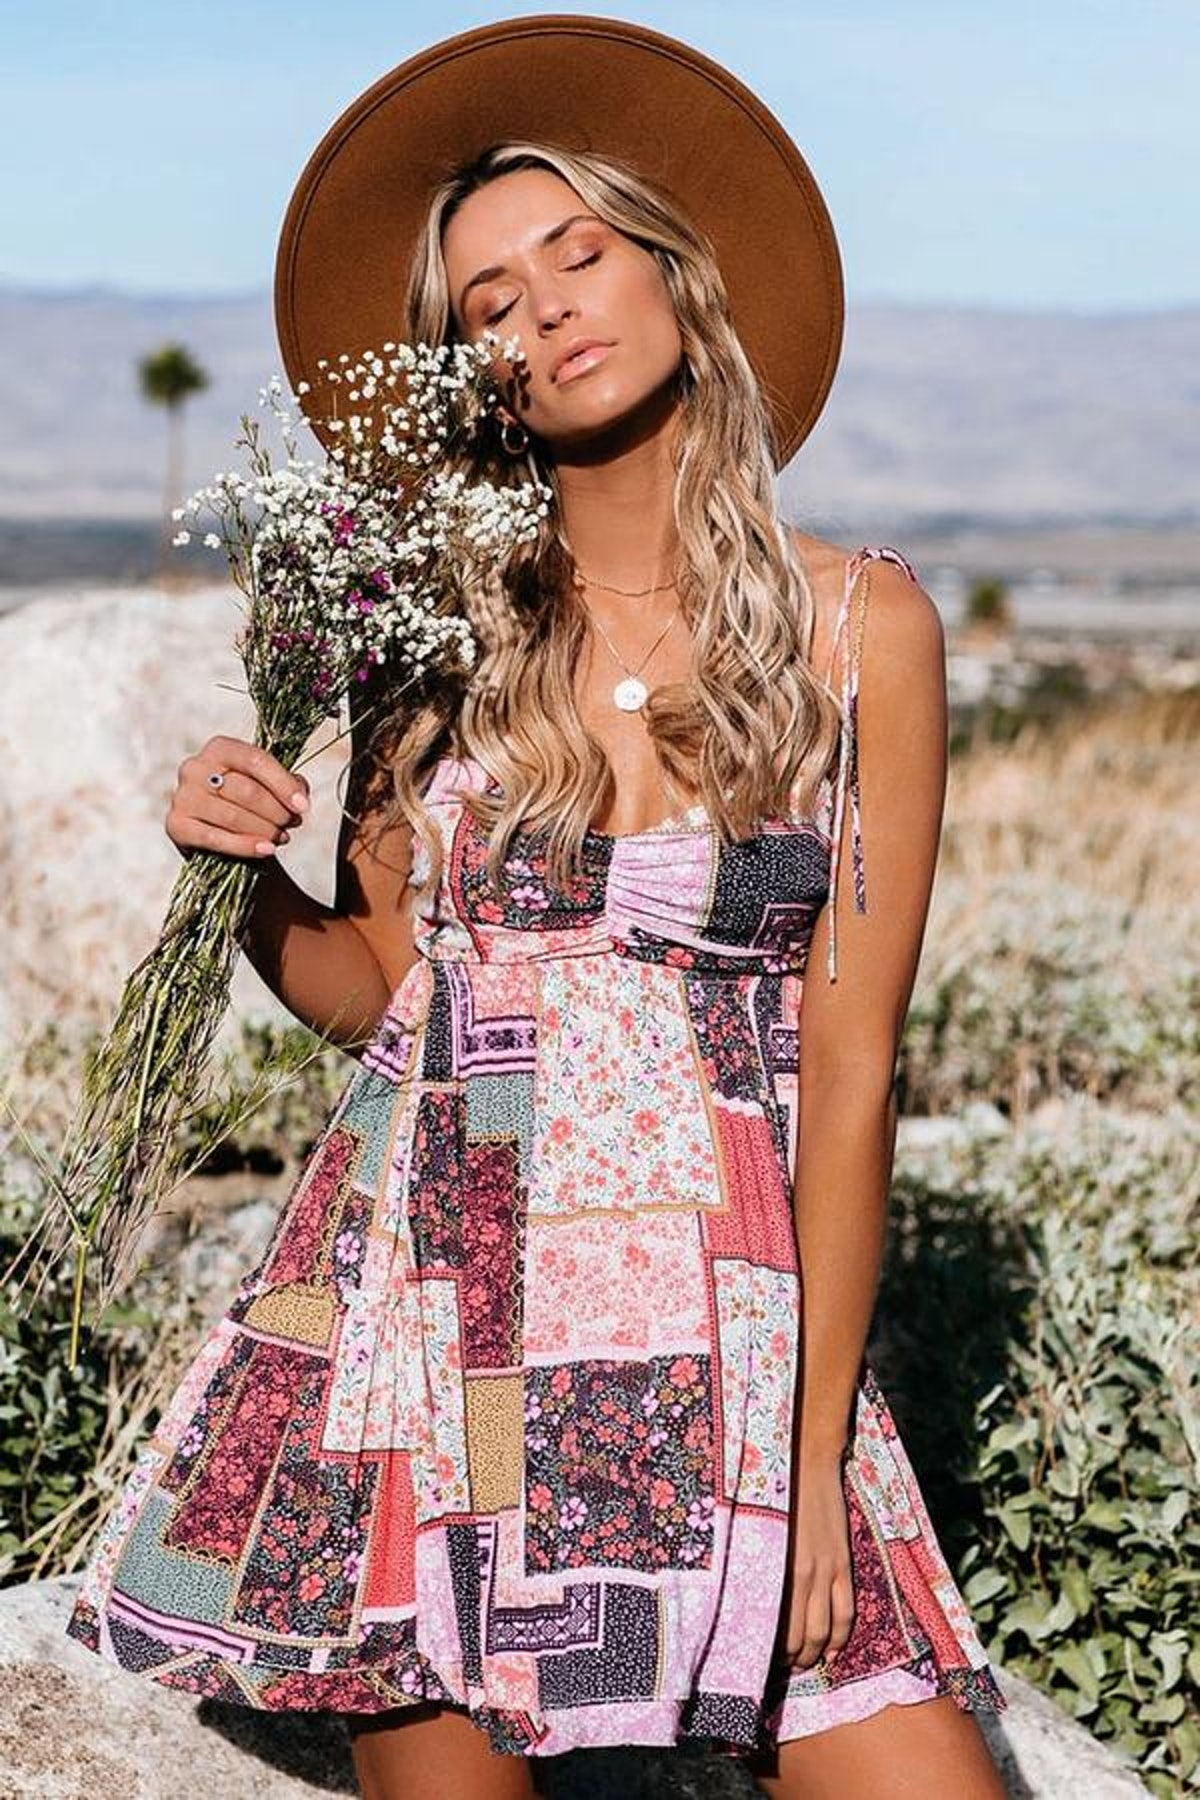 Rosedress Flowy Spaghetti Strap Patchwork Ditsy Floral Mini Boho Chic DressD